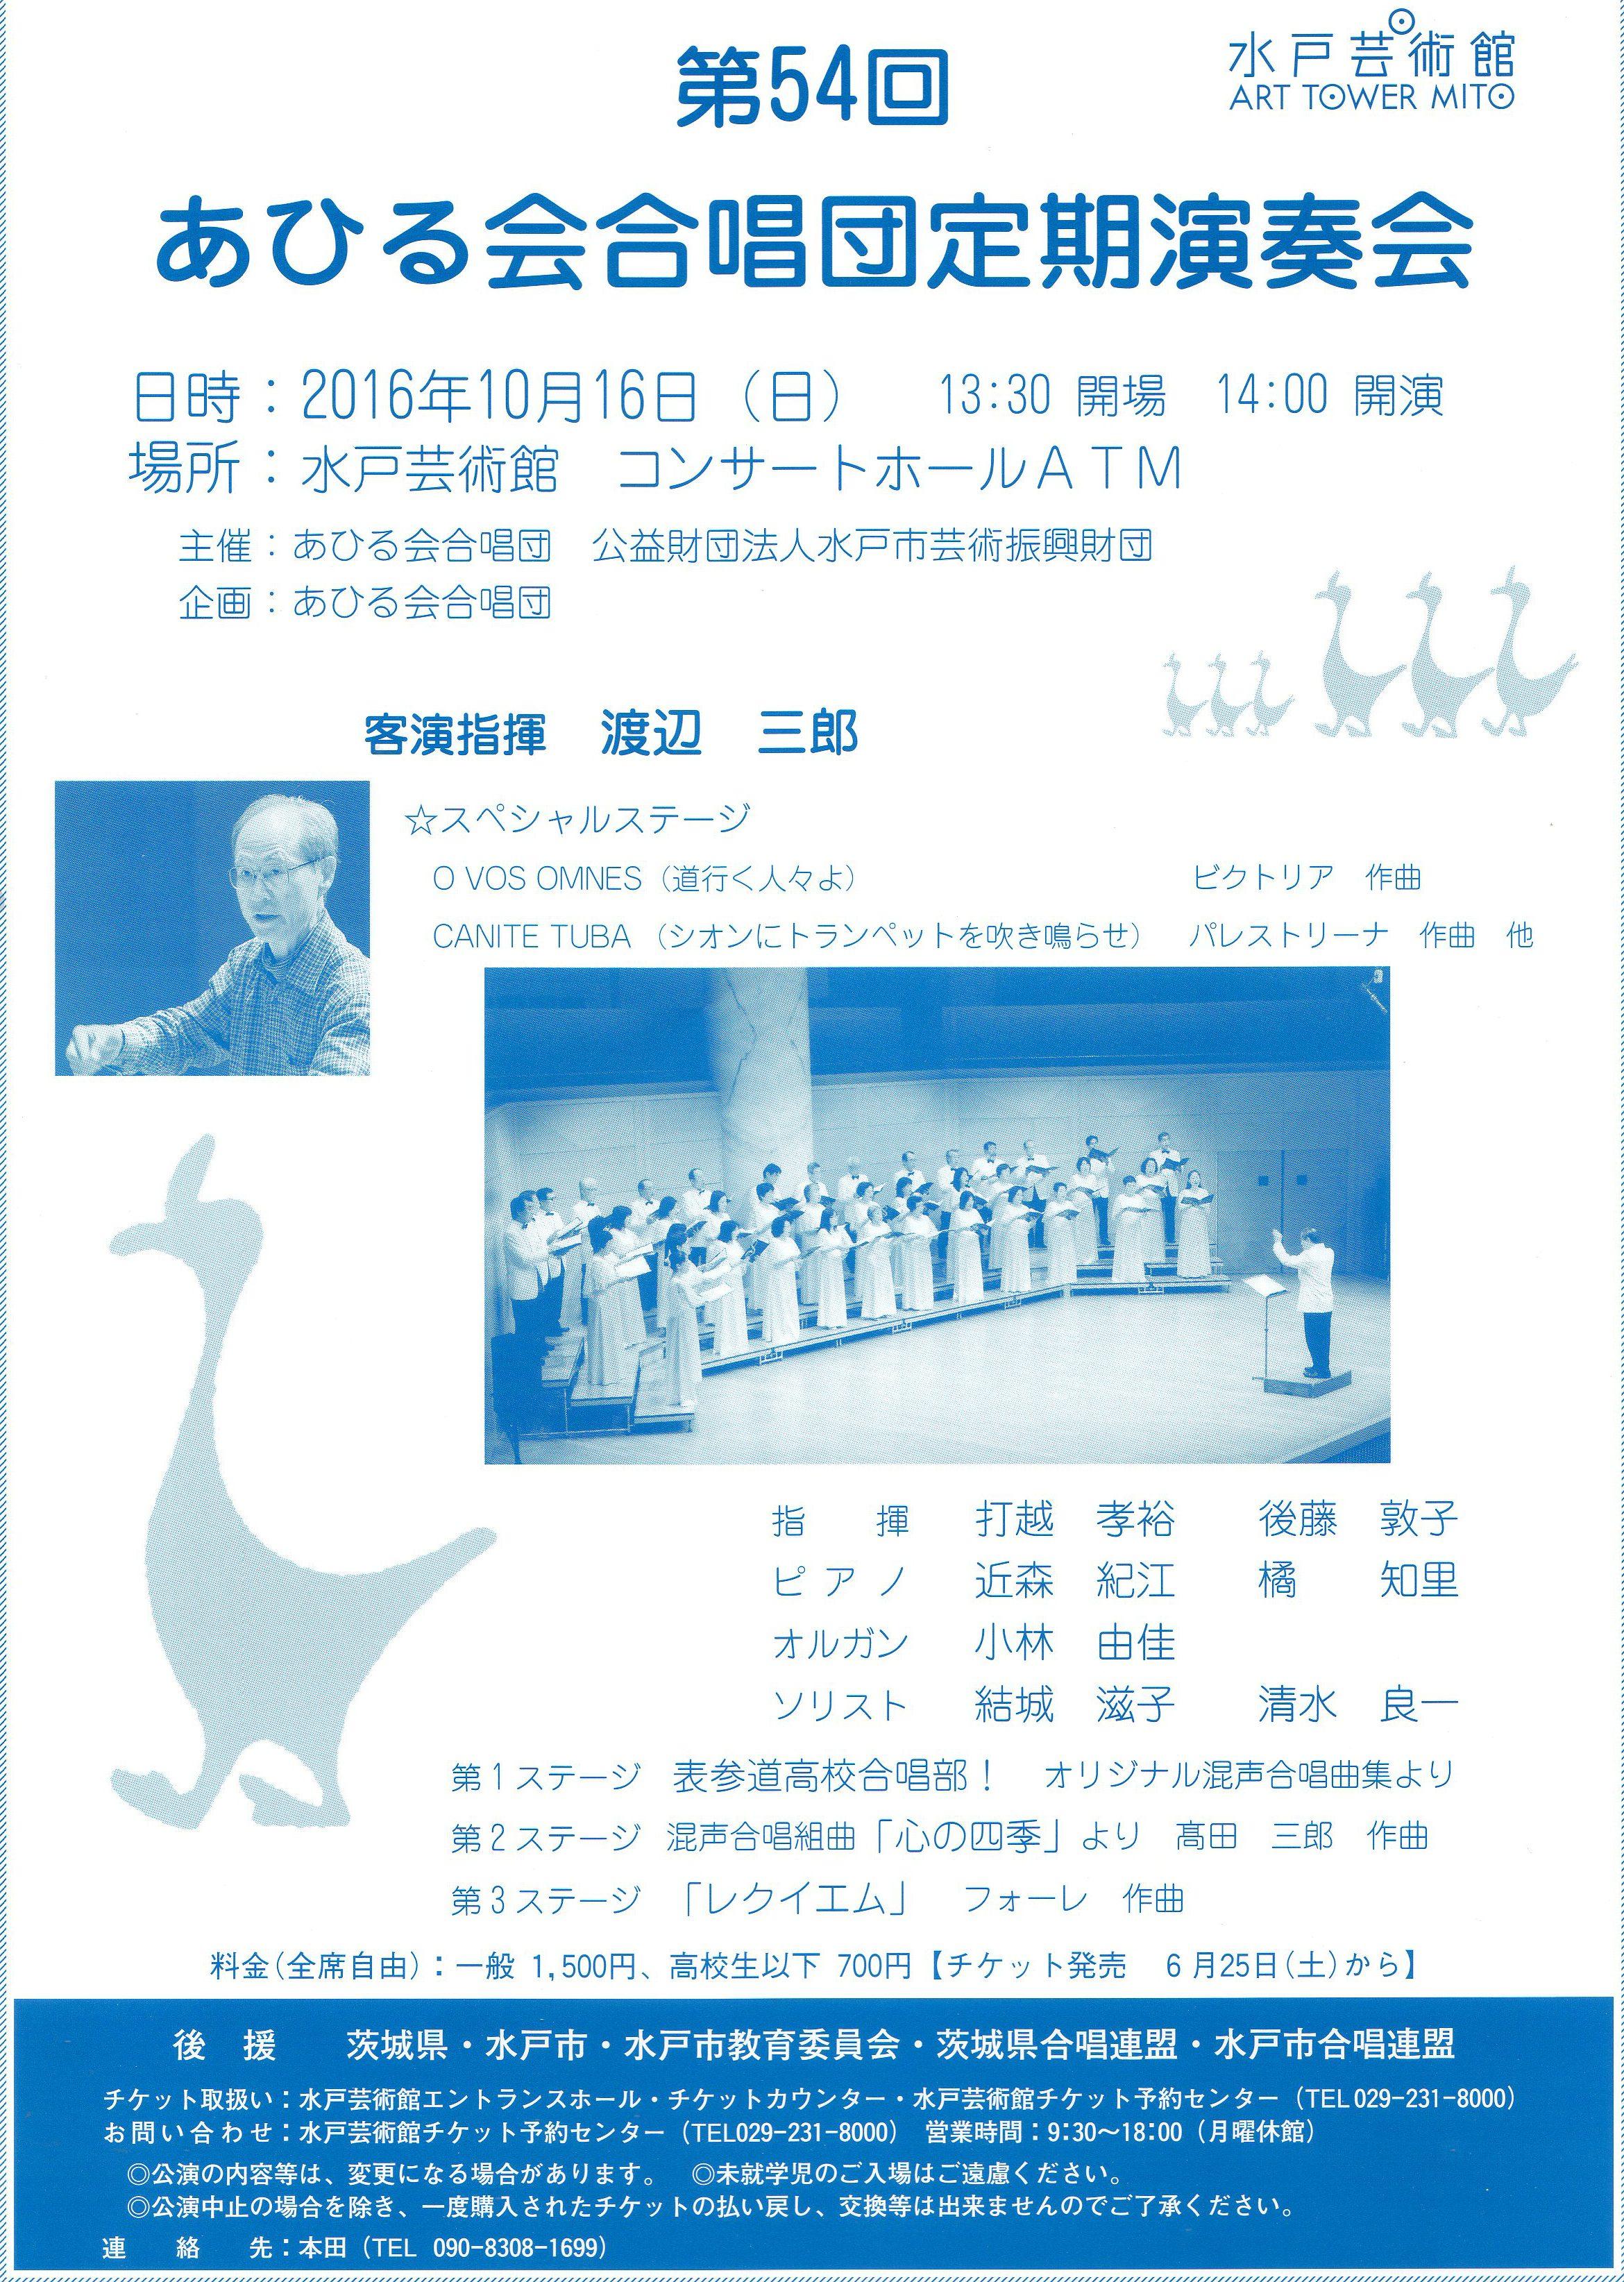 第54回定期演奏会 2016年10月16日(日) 水戸芸術館 コンサートホールATM